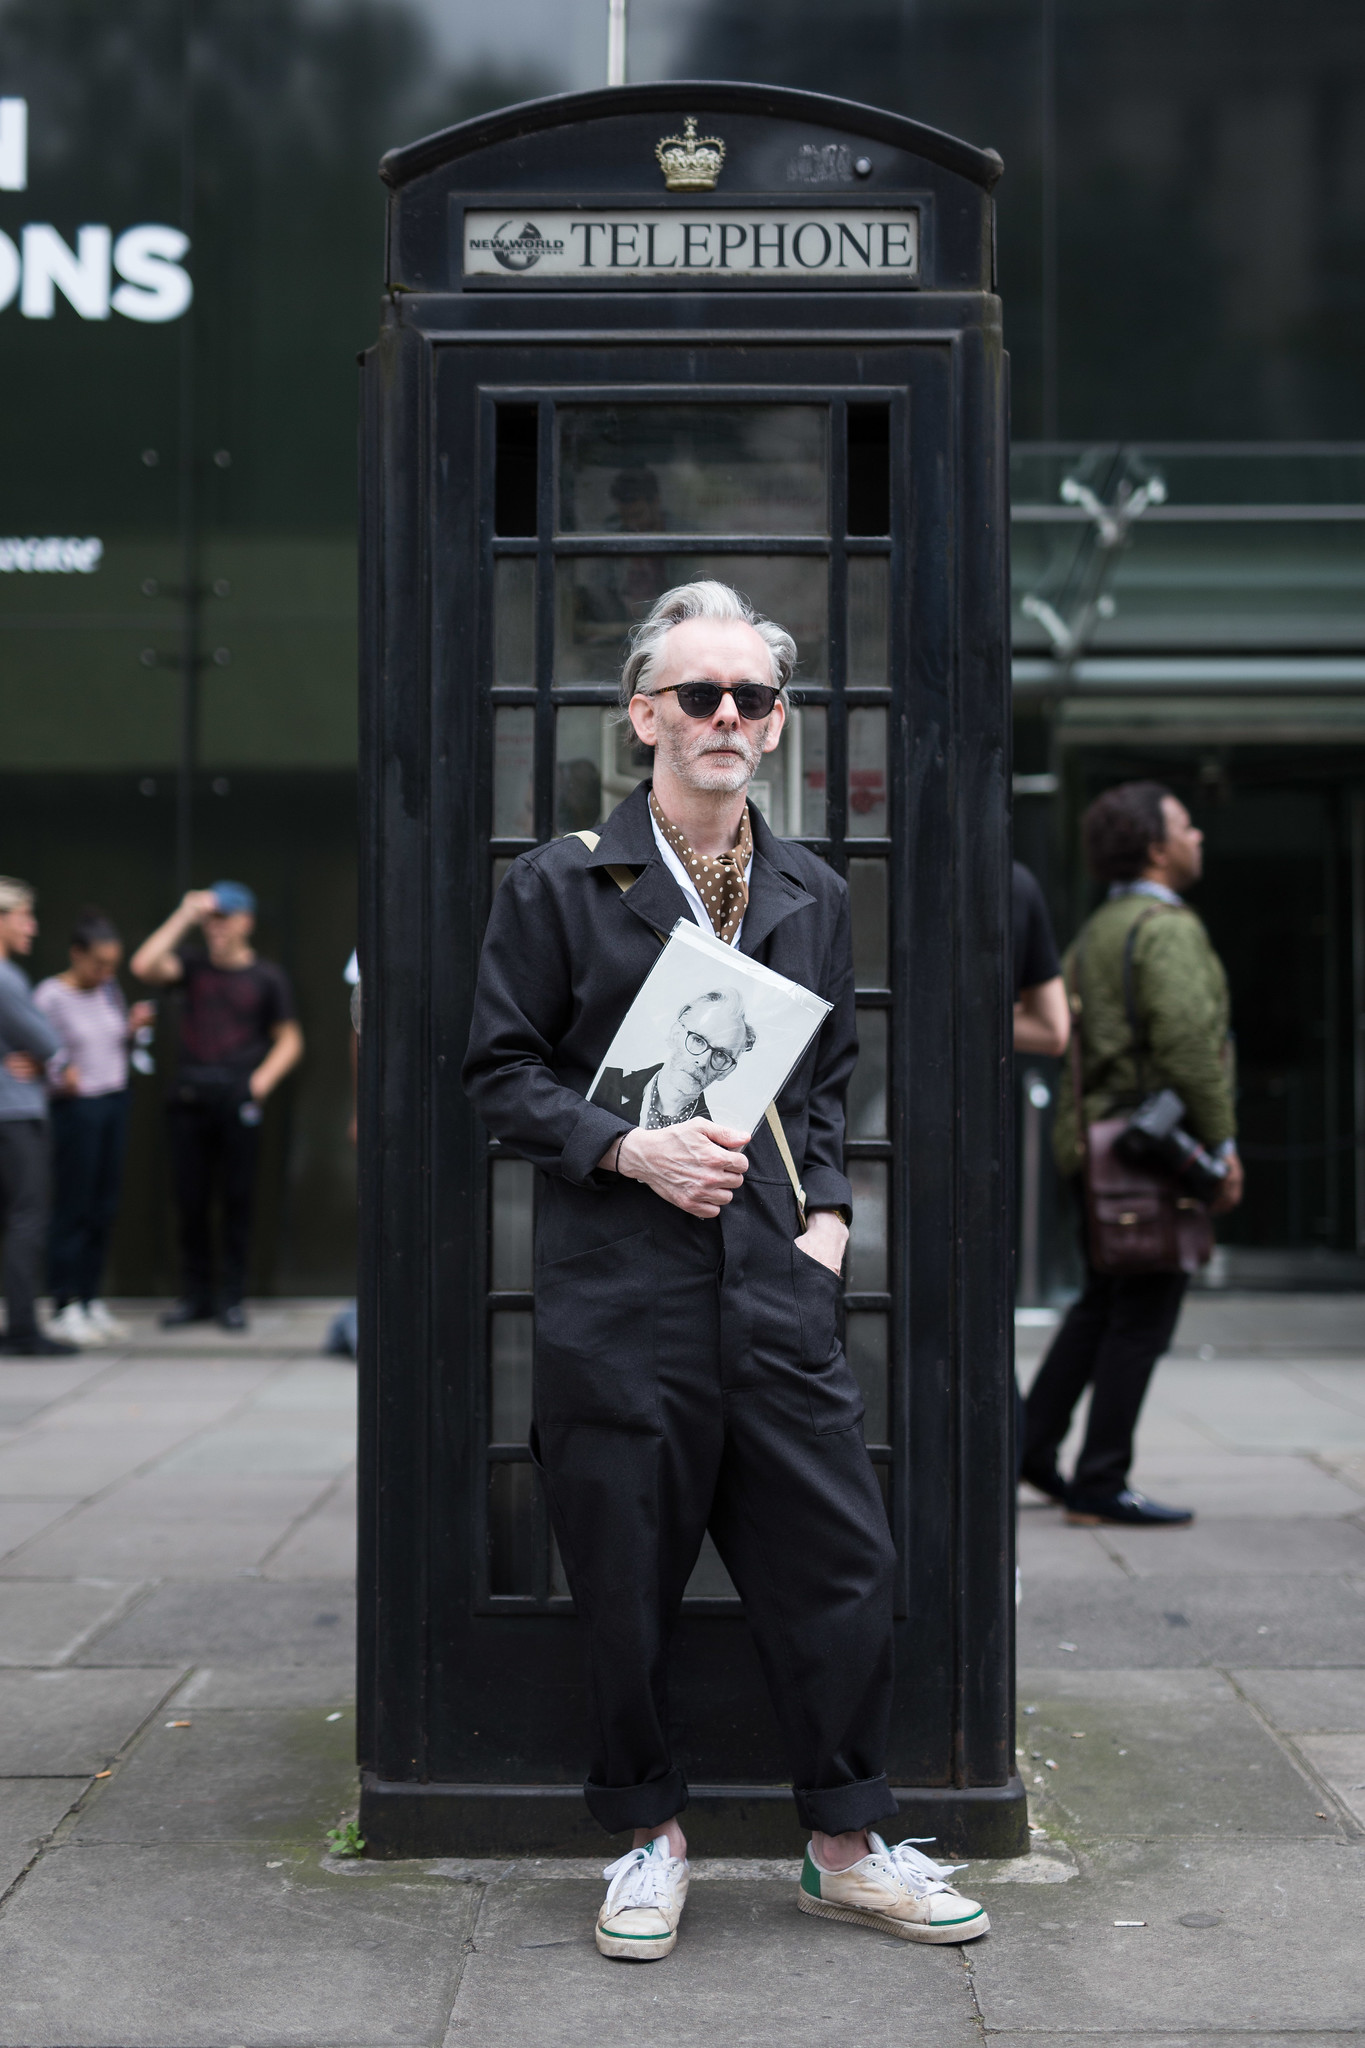 Street Style - Robert J Railton, London Collections: Men